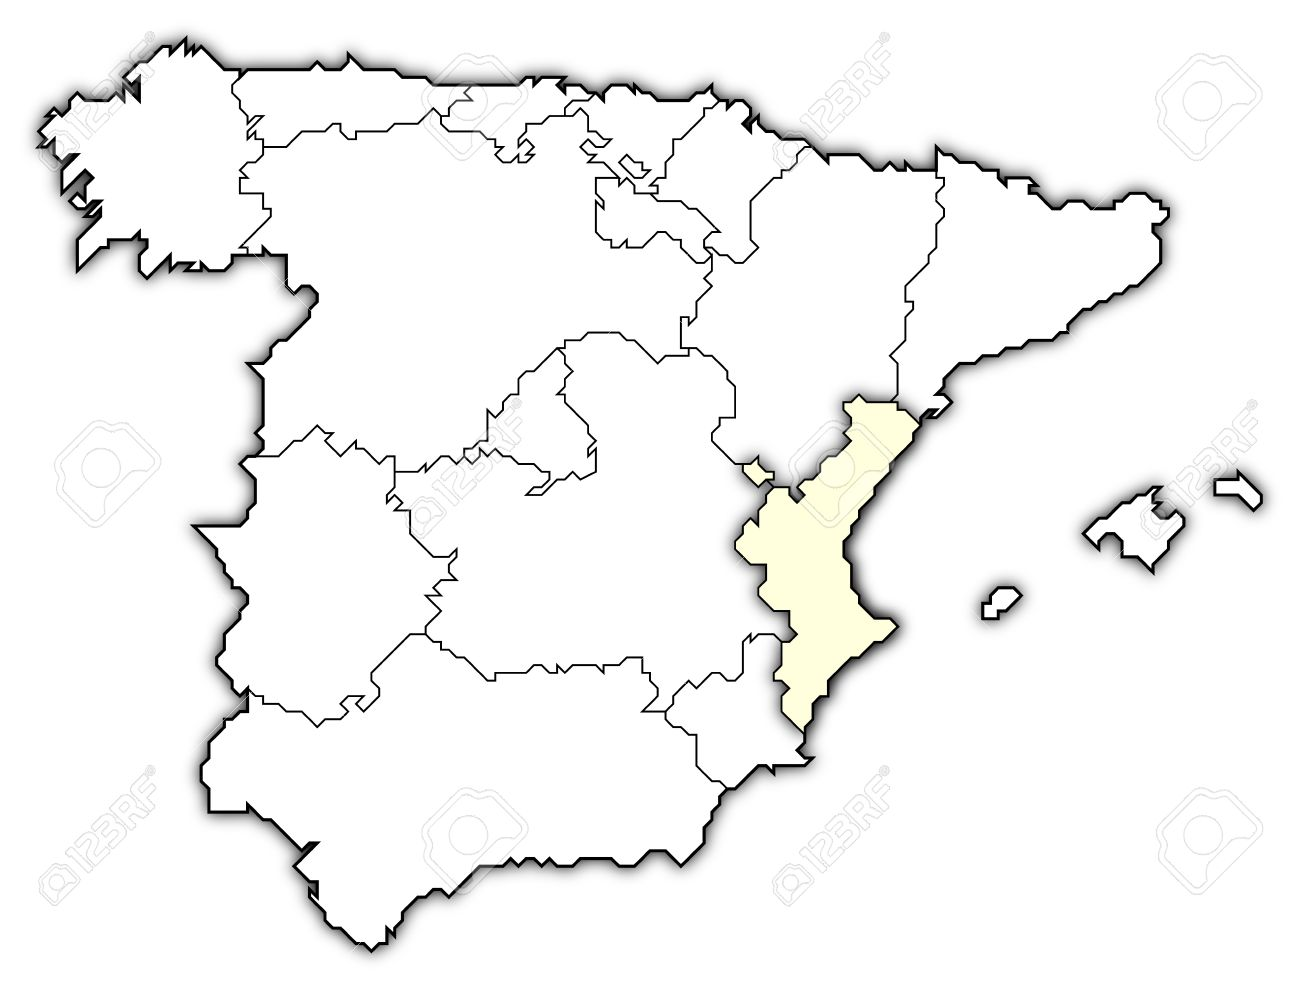 Autonome Regionen Spanien Karte.Stock Photo